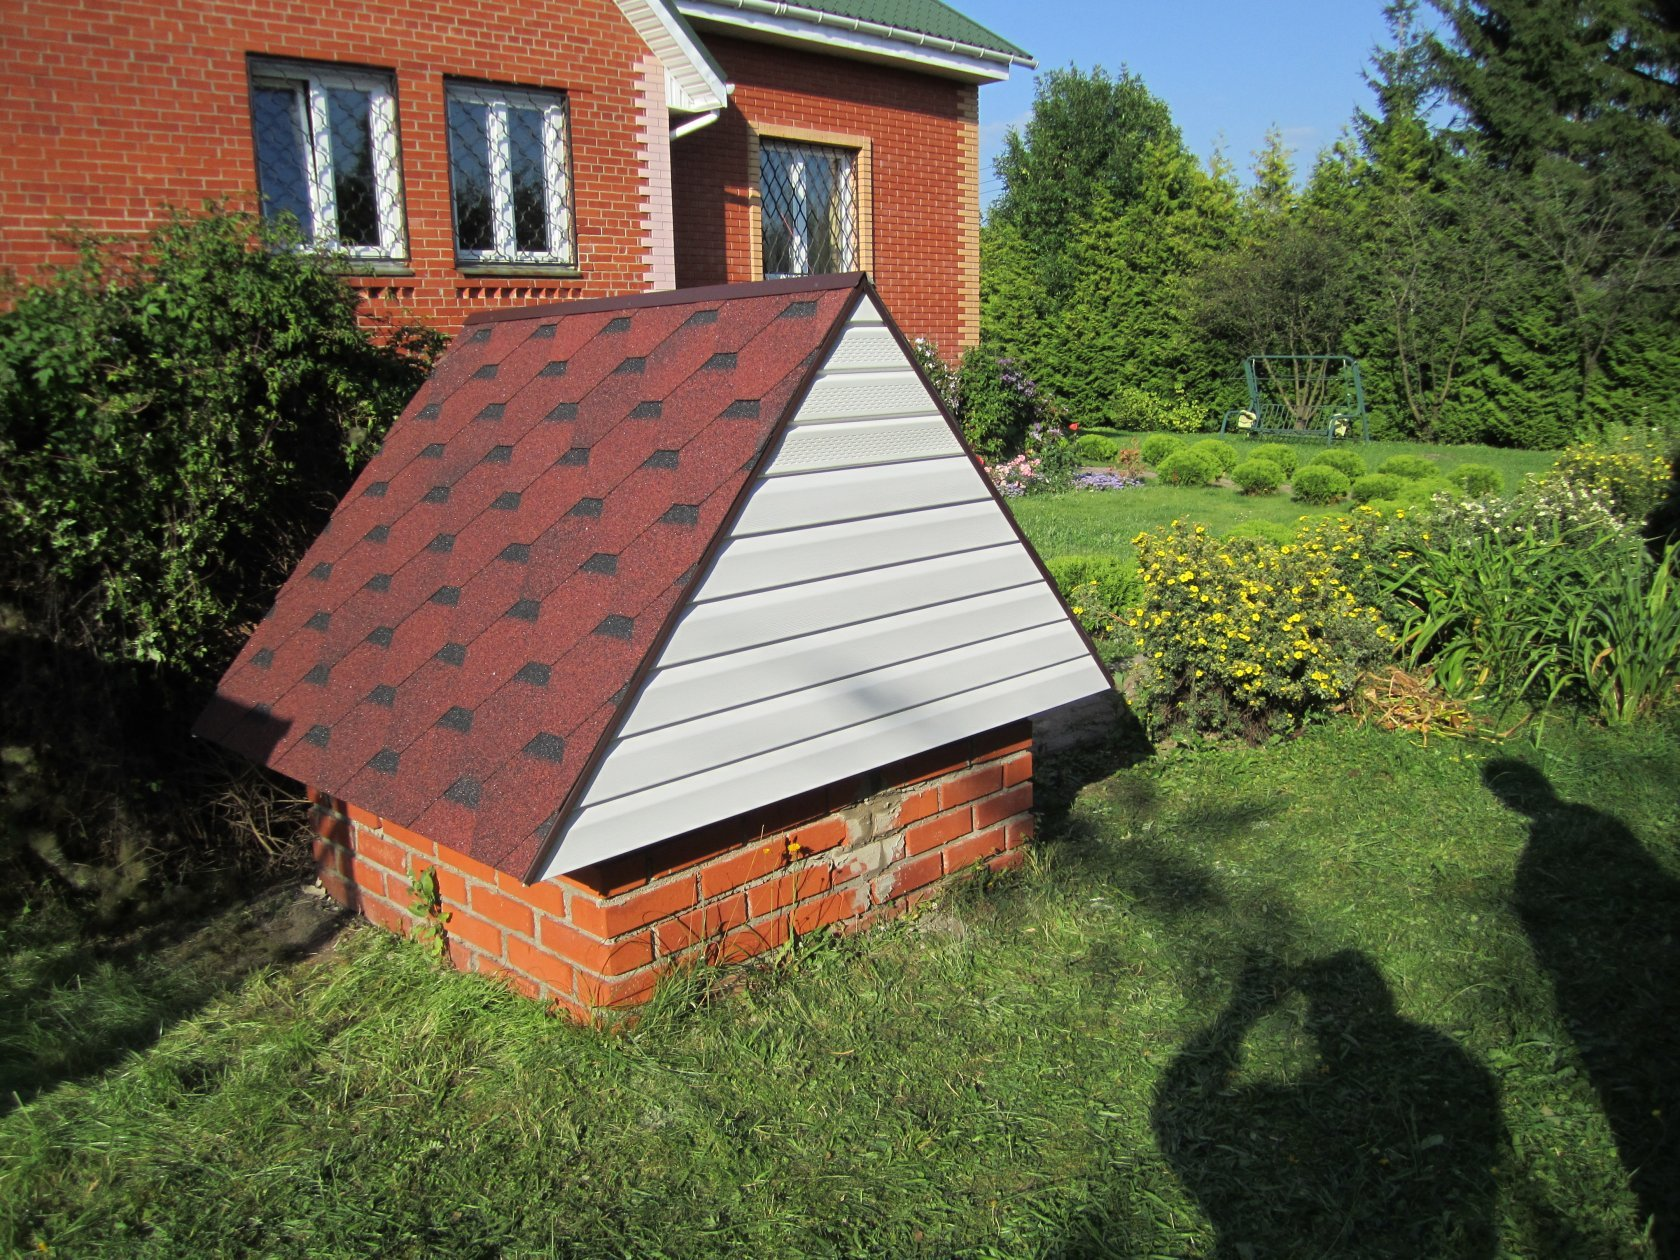 домик для скважины на даче фото под